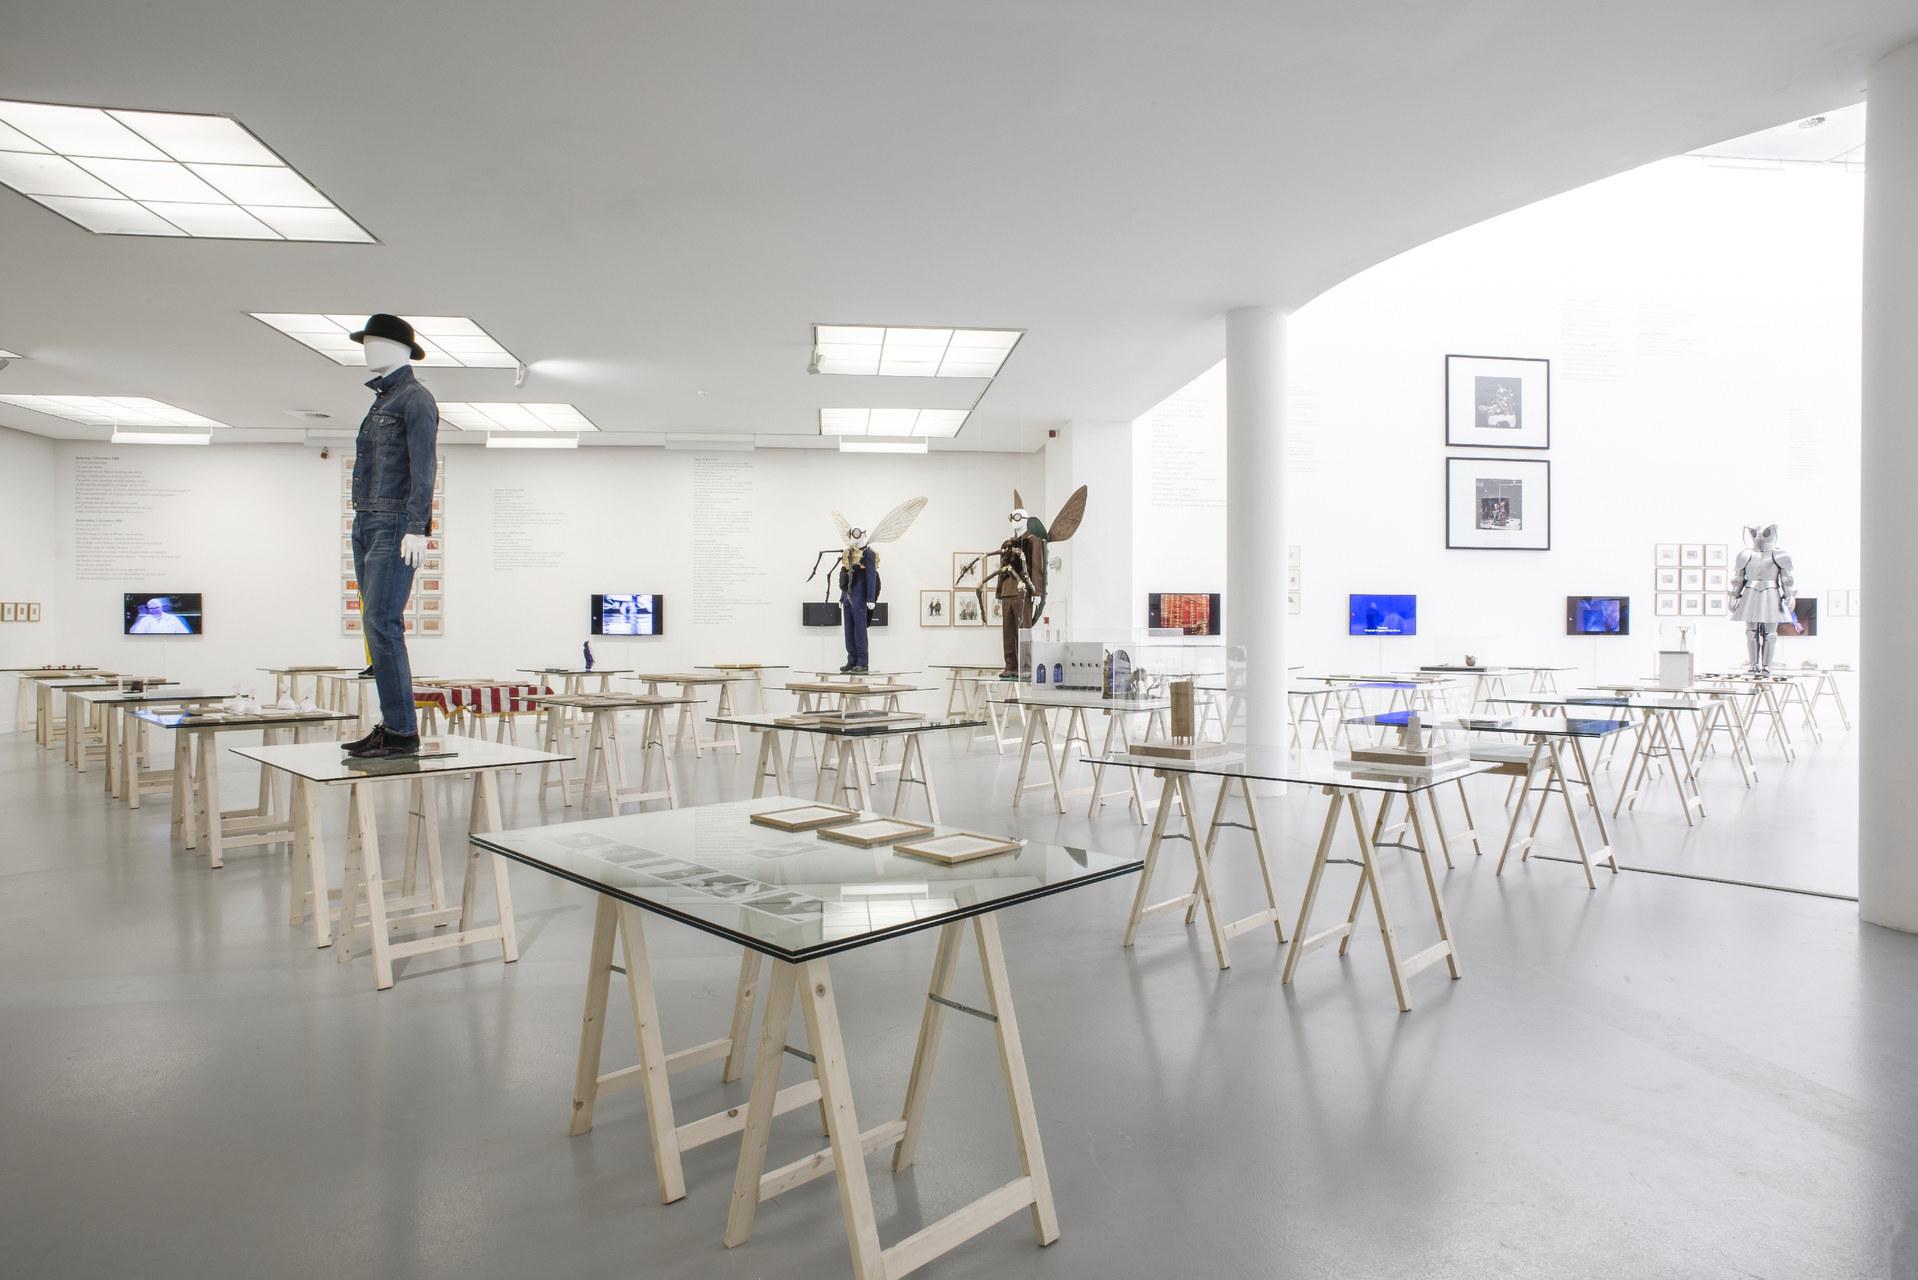 Jan_Fabre,_exhibition_view_M_HKA_2015_photo_M_HKAclinckx24